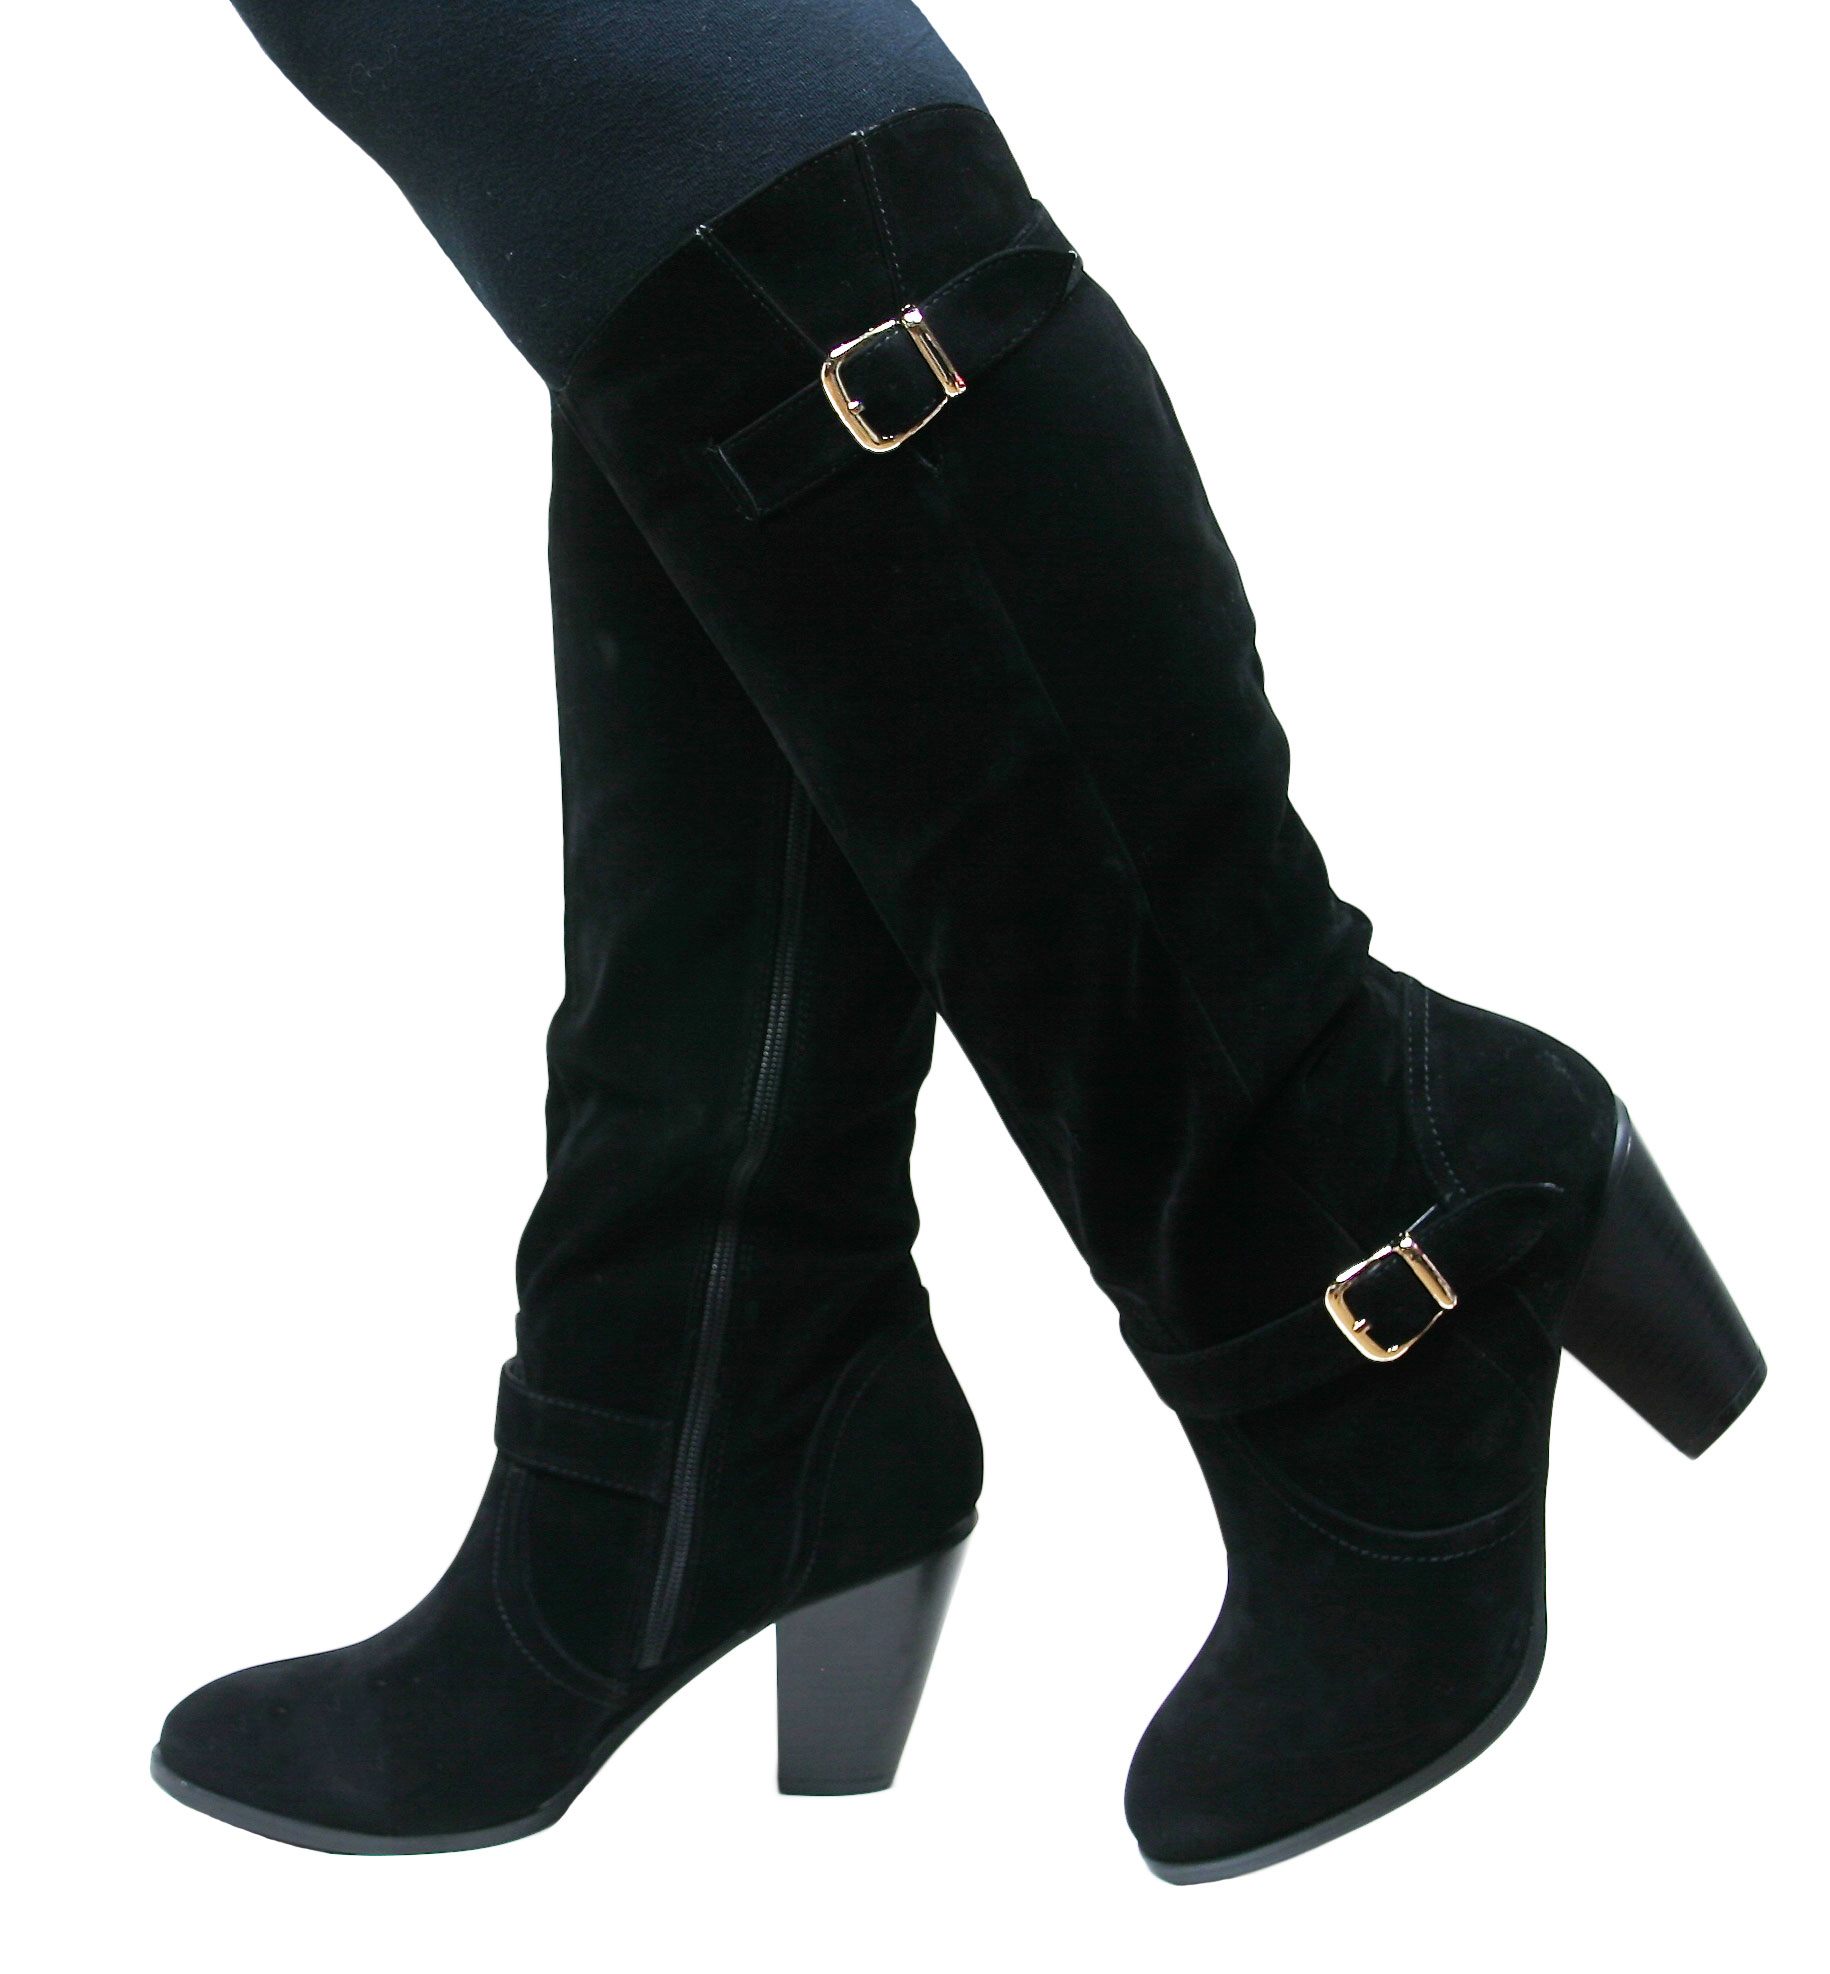 Womens Ladies Knee High Wide-Calf Buckle Detail Zip Up Boots   eBay